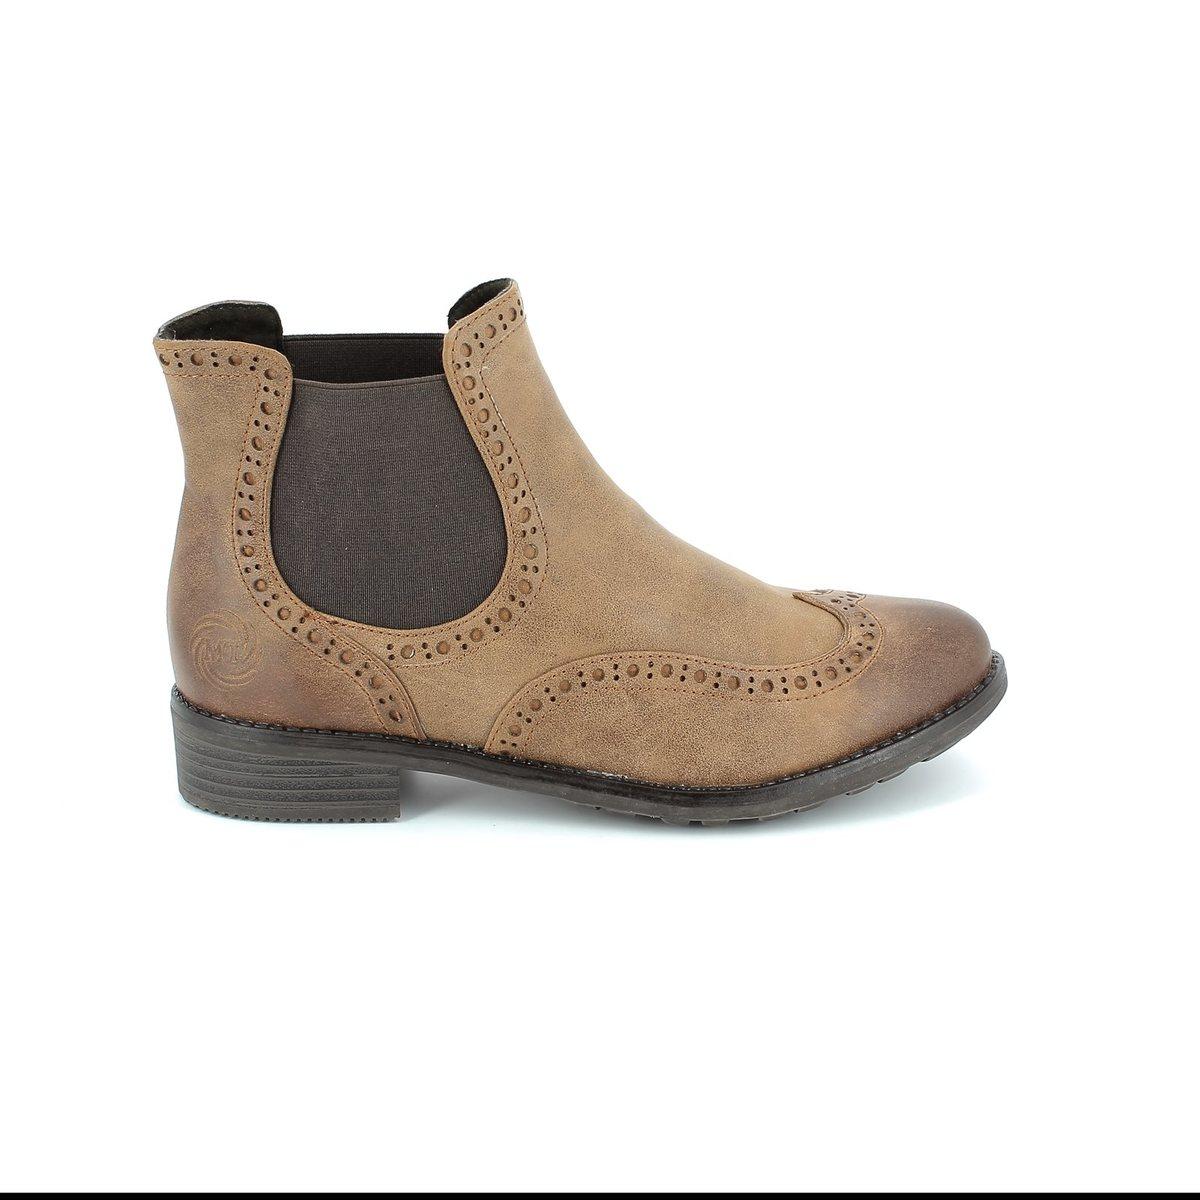 marco tozzi drapbro 25318 340 tan ankle boots. Black Bedroom Furniture Sets. Home Design Ideas